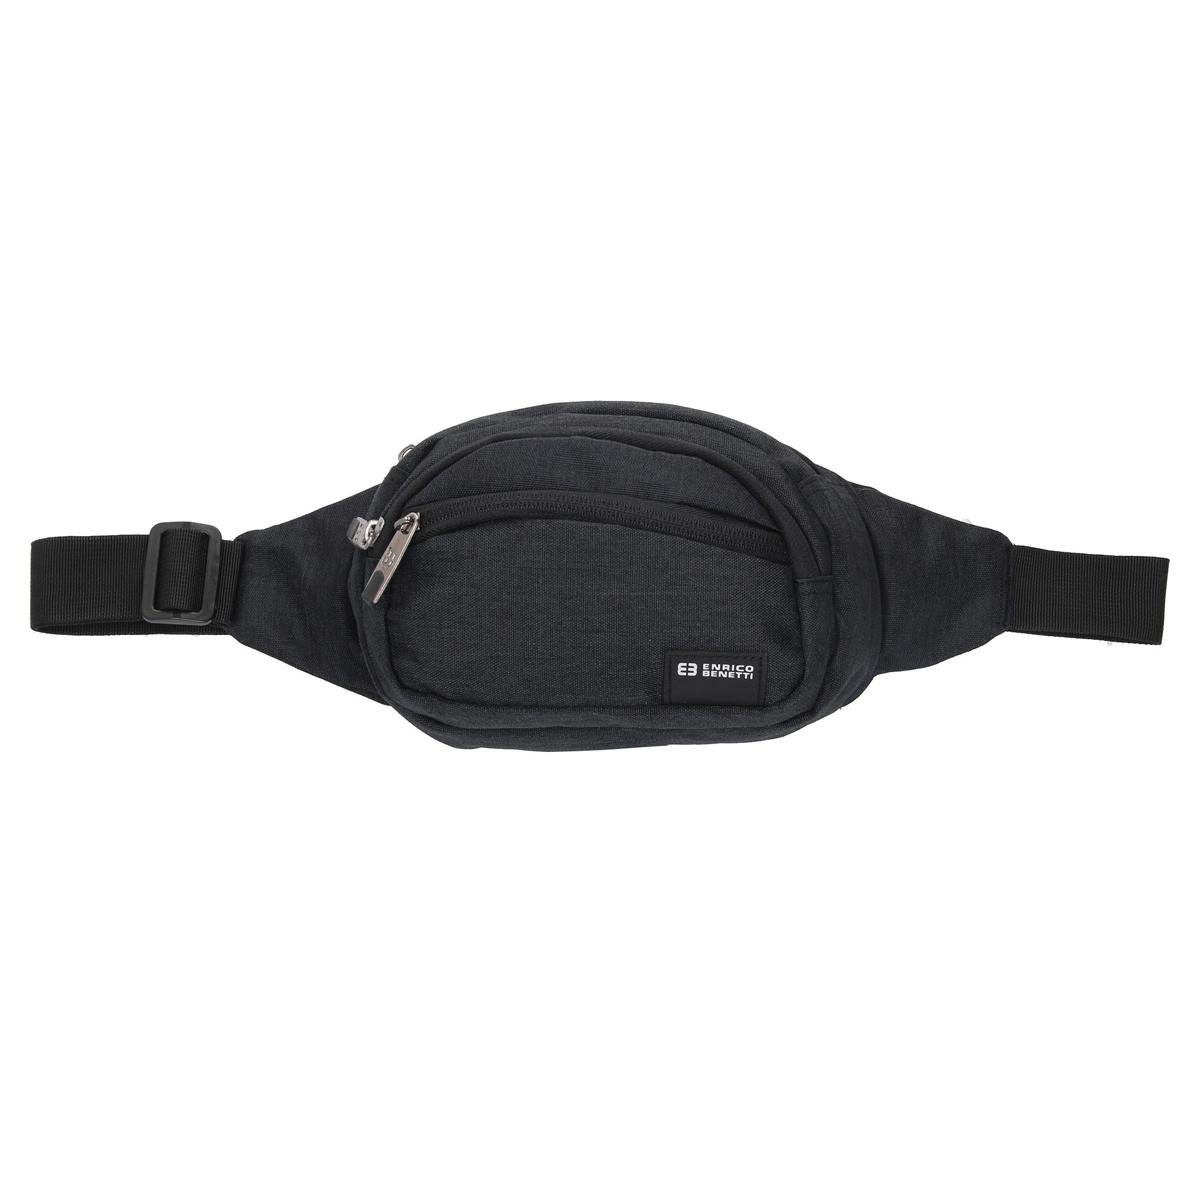 Pochette ceinture / banane \'Enrico Benetti\' noir - 21x145x9 cm - [Q1793]